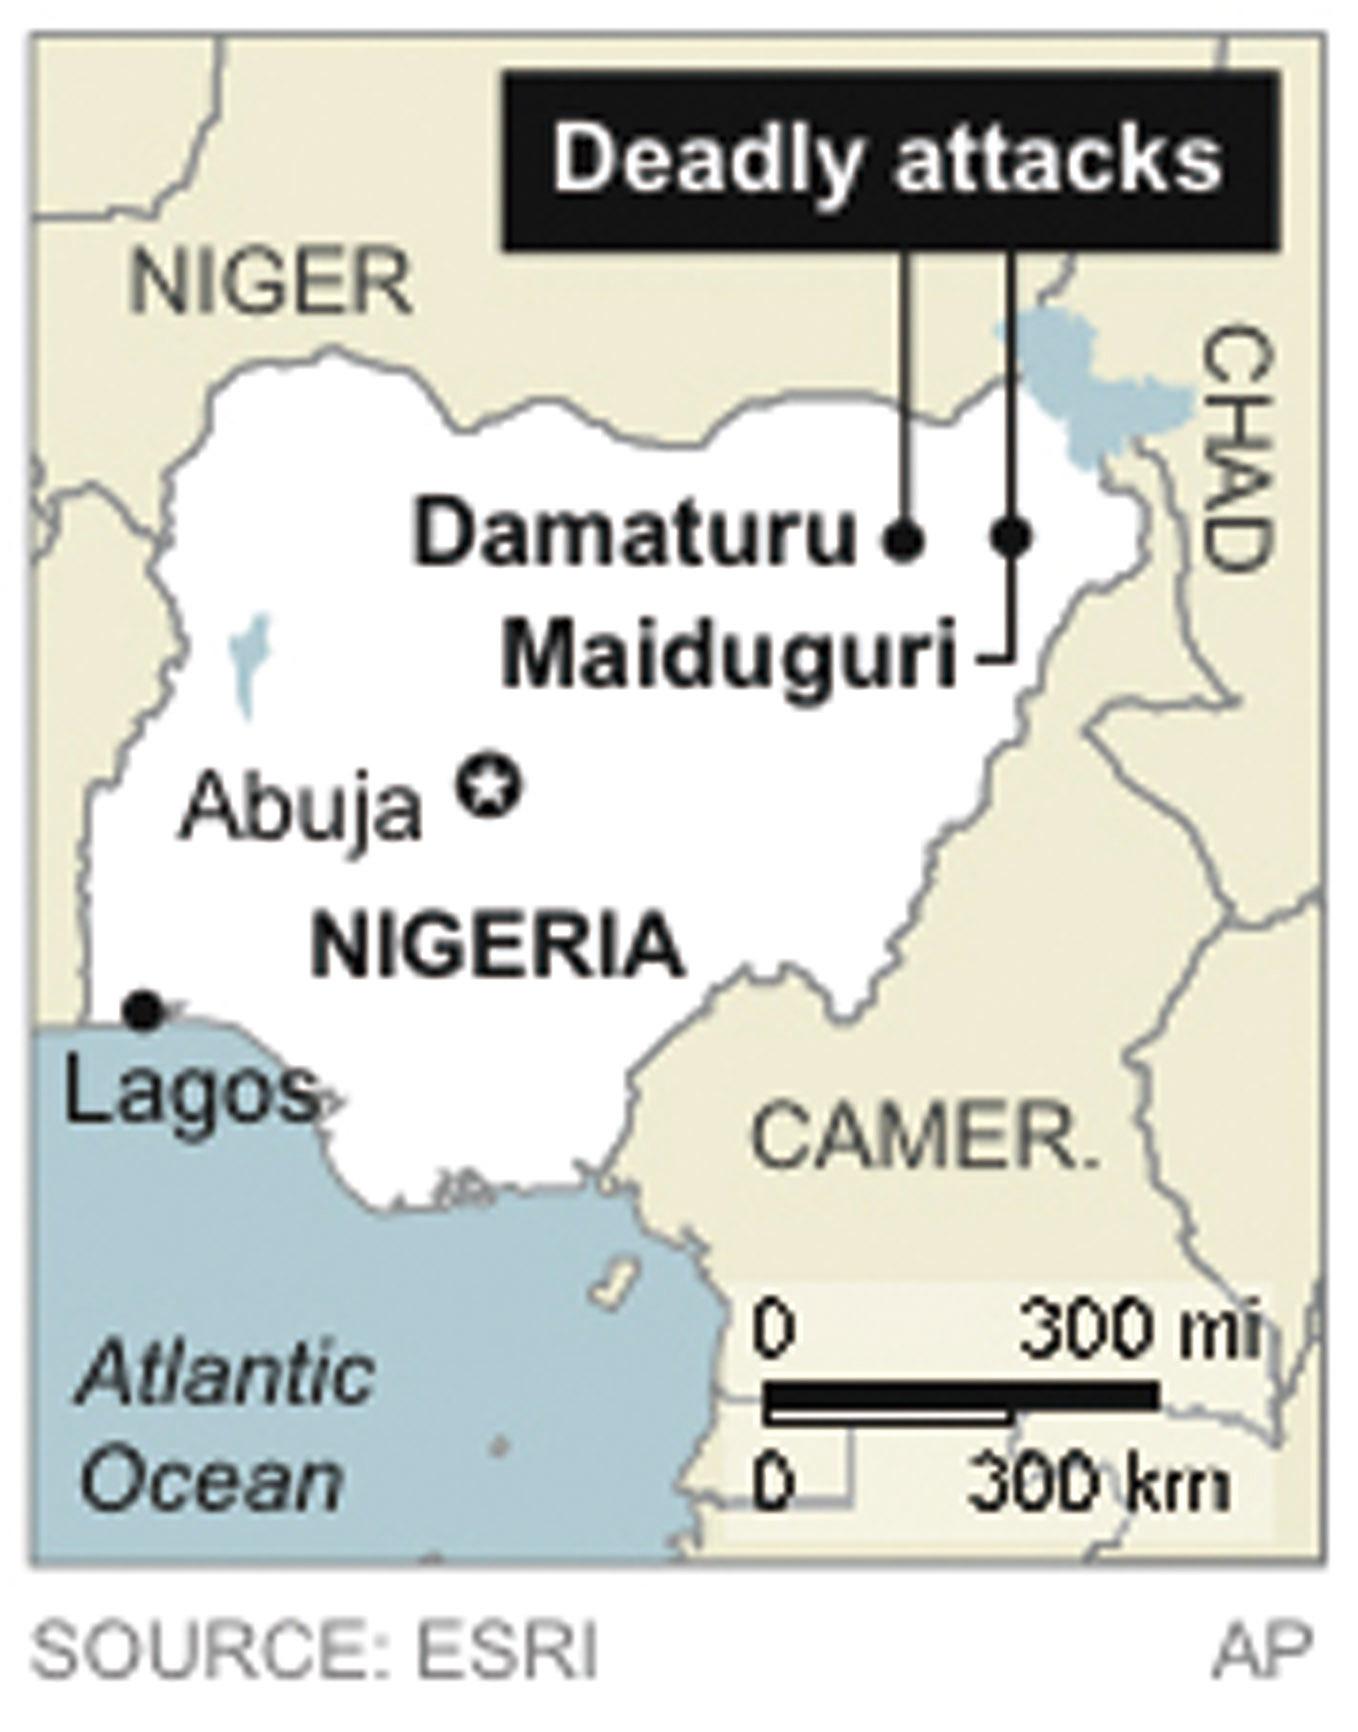 Map locates deadly attacks in northeast Nigeria. (Associated Press)